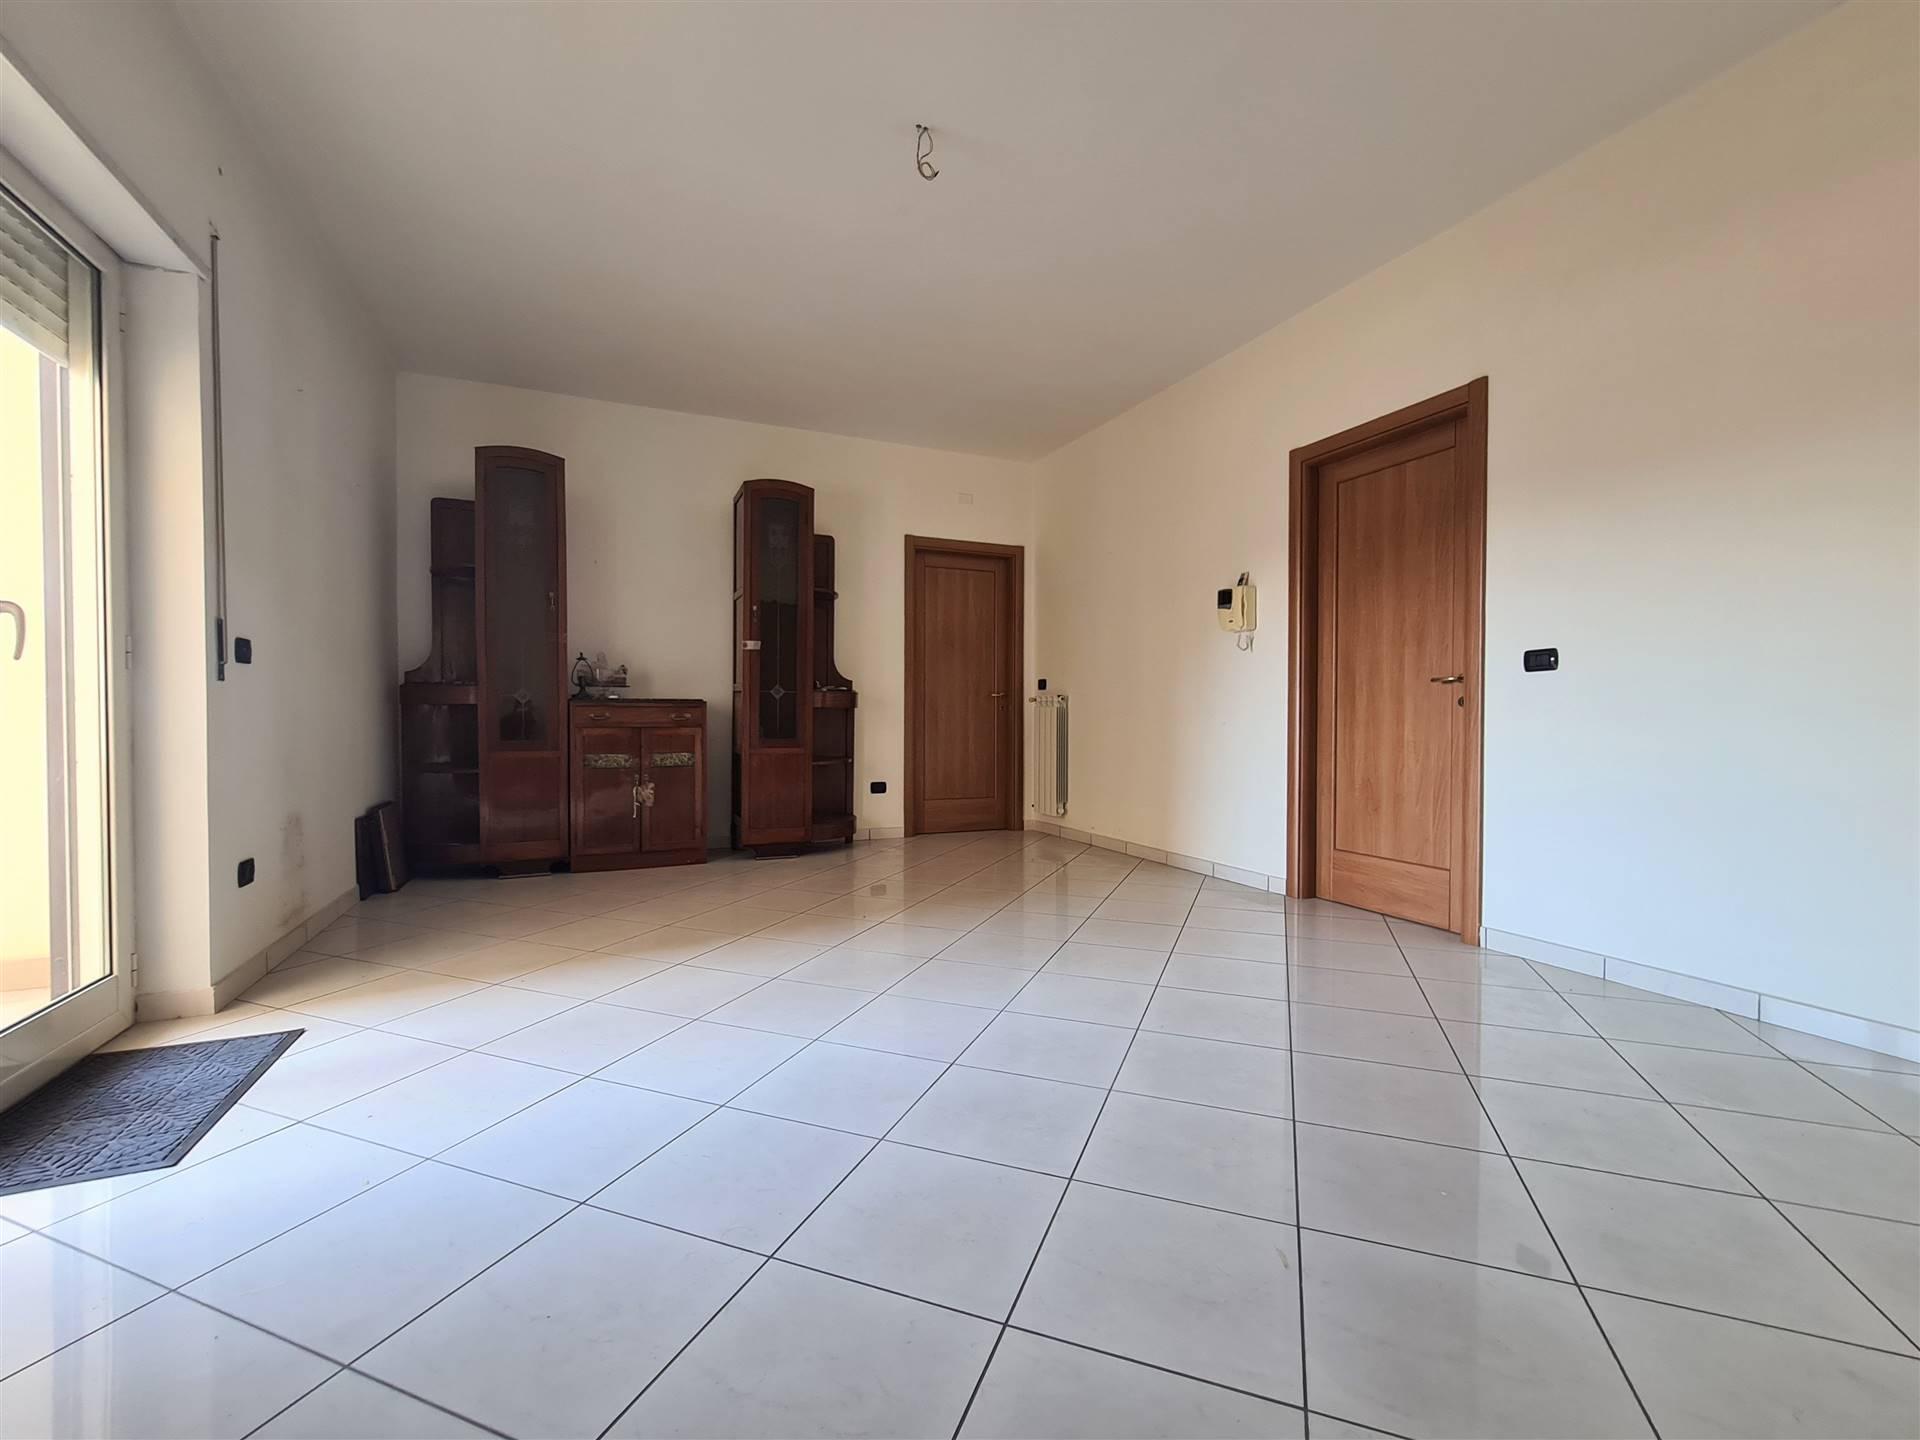 AF901A-Appartamento-SANTA-MARIA-CAPUA-VETERE-Via-Achille-Grandi-